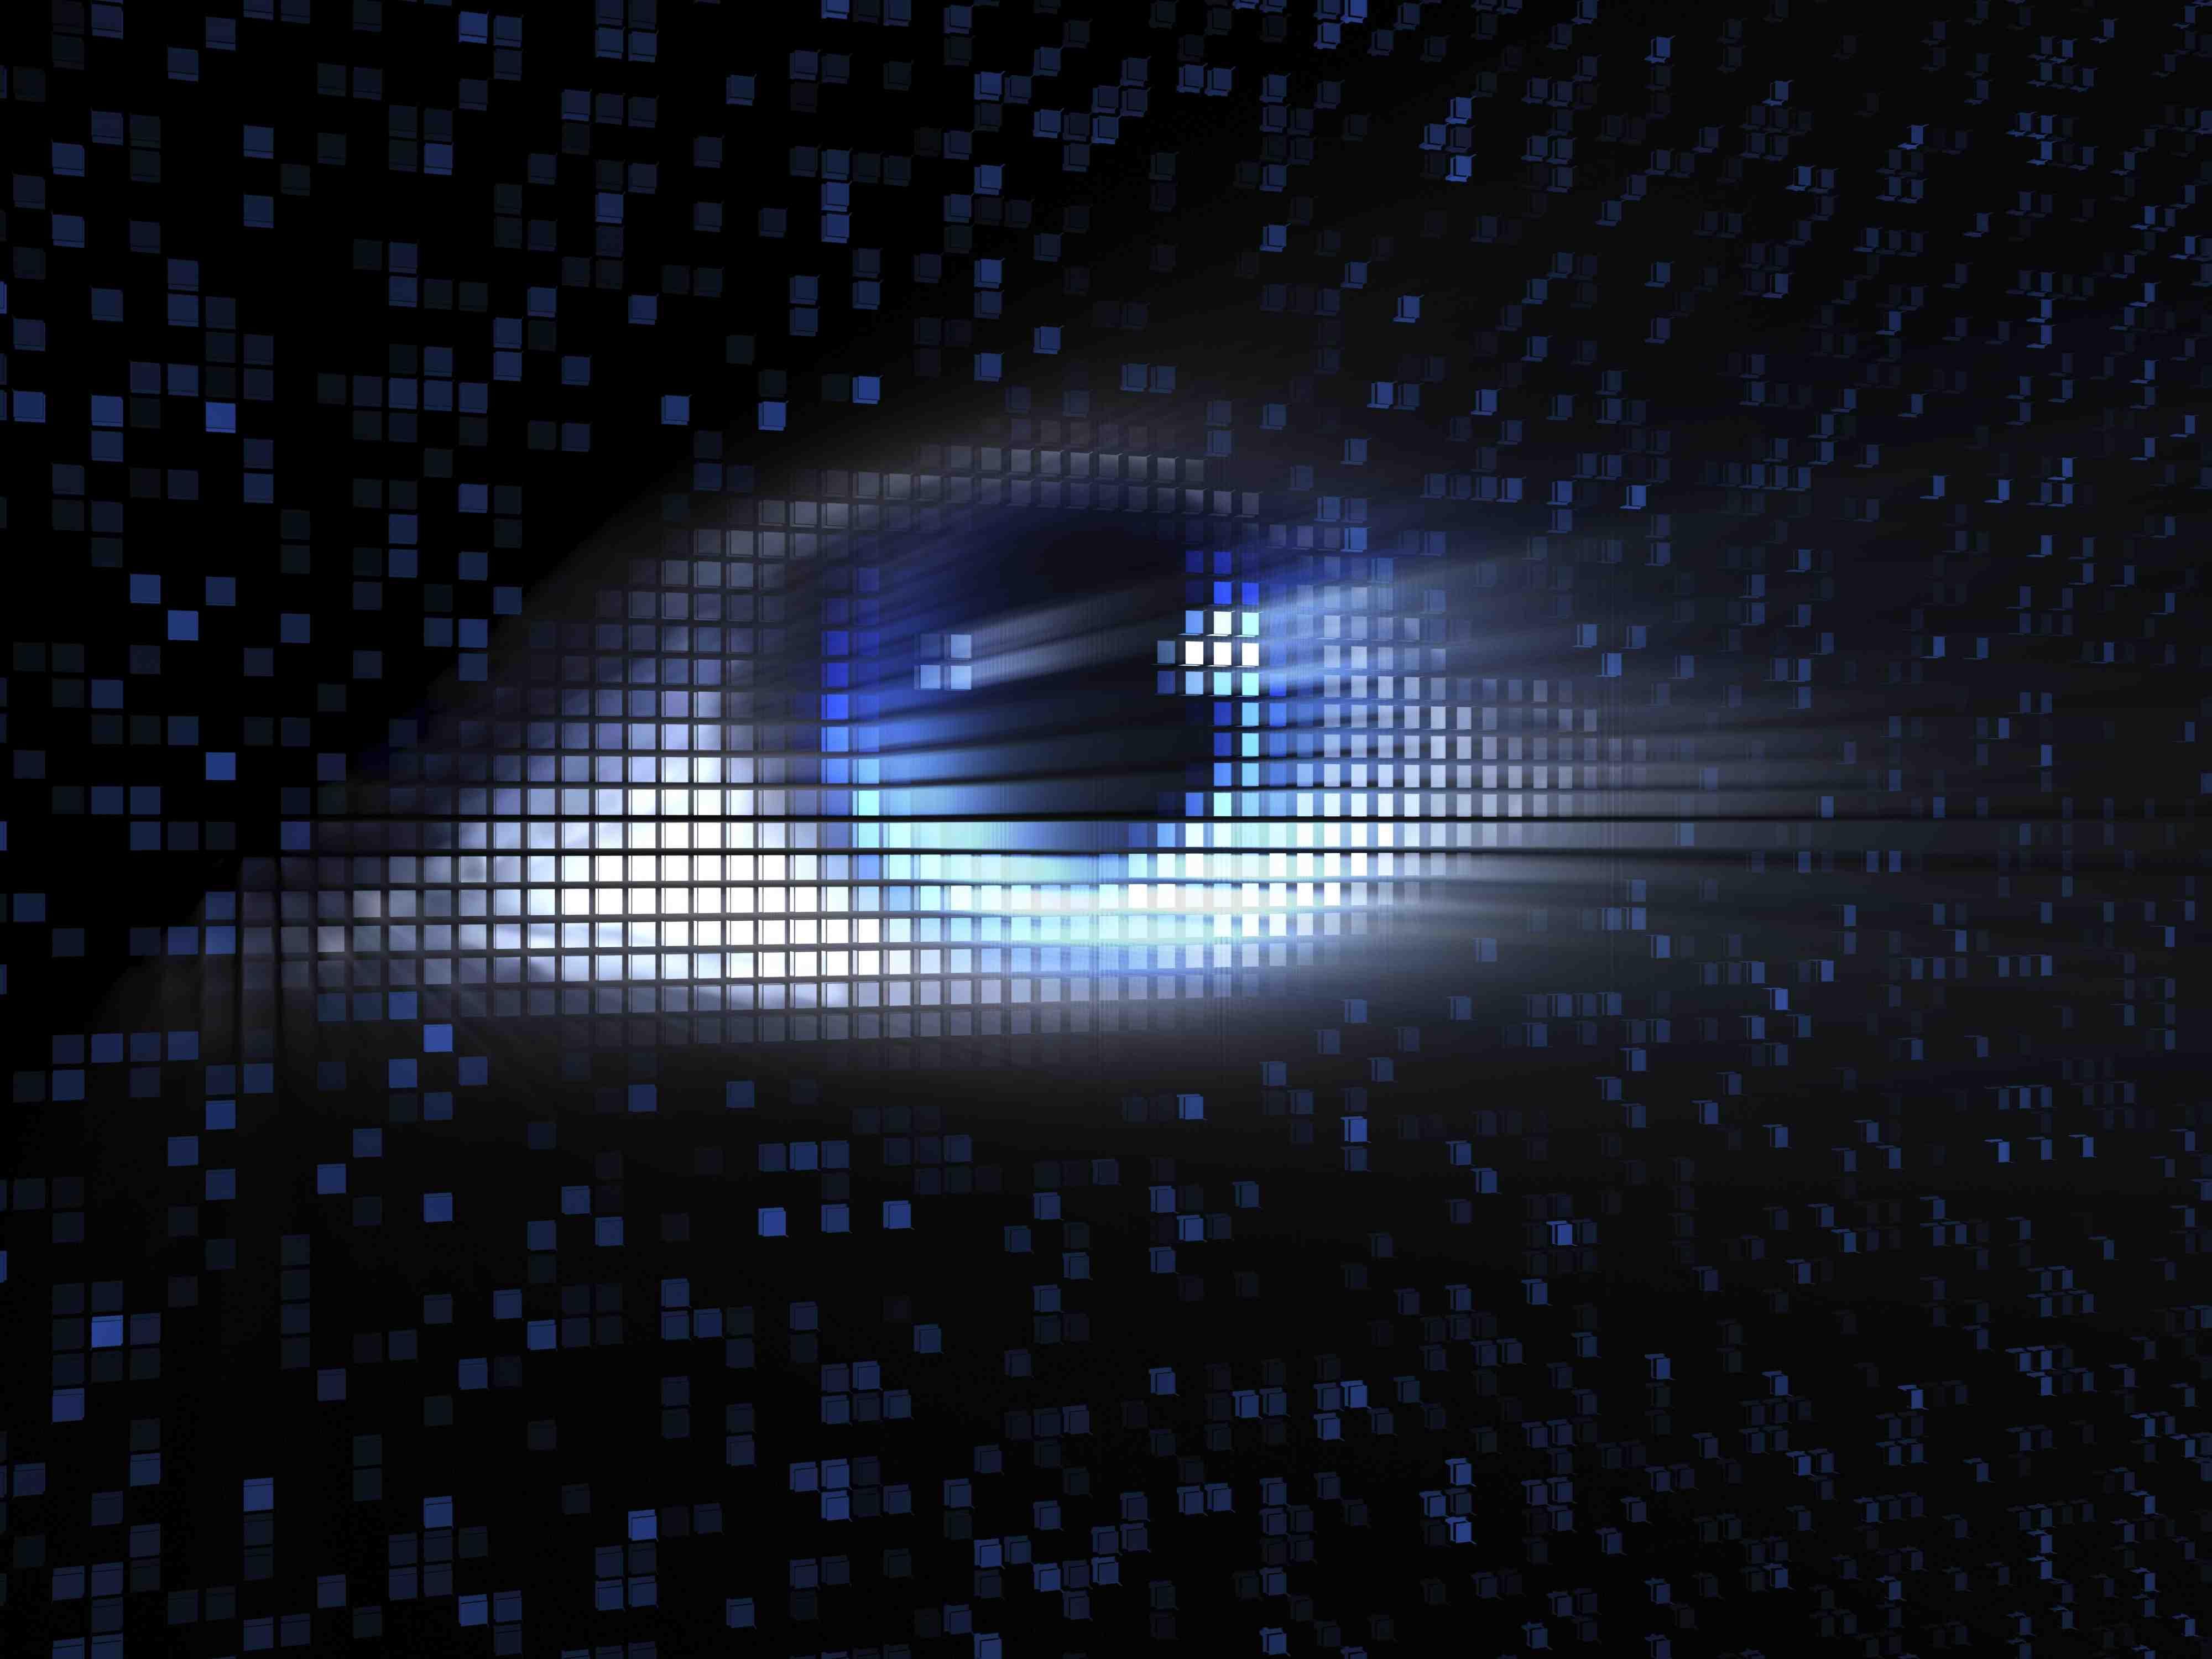 digitized eye